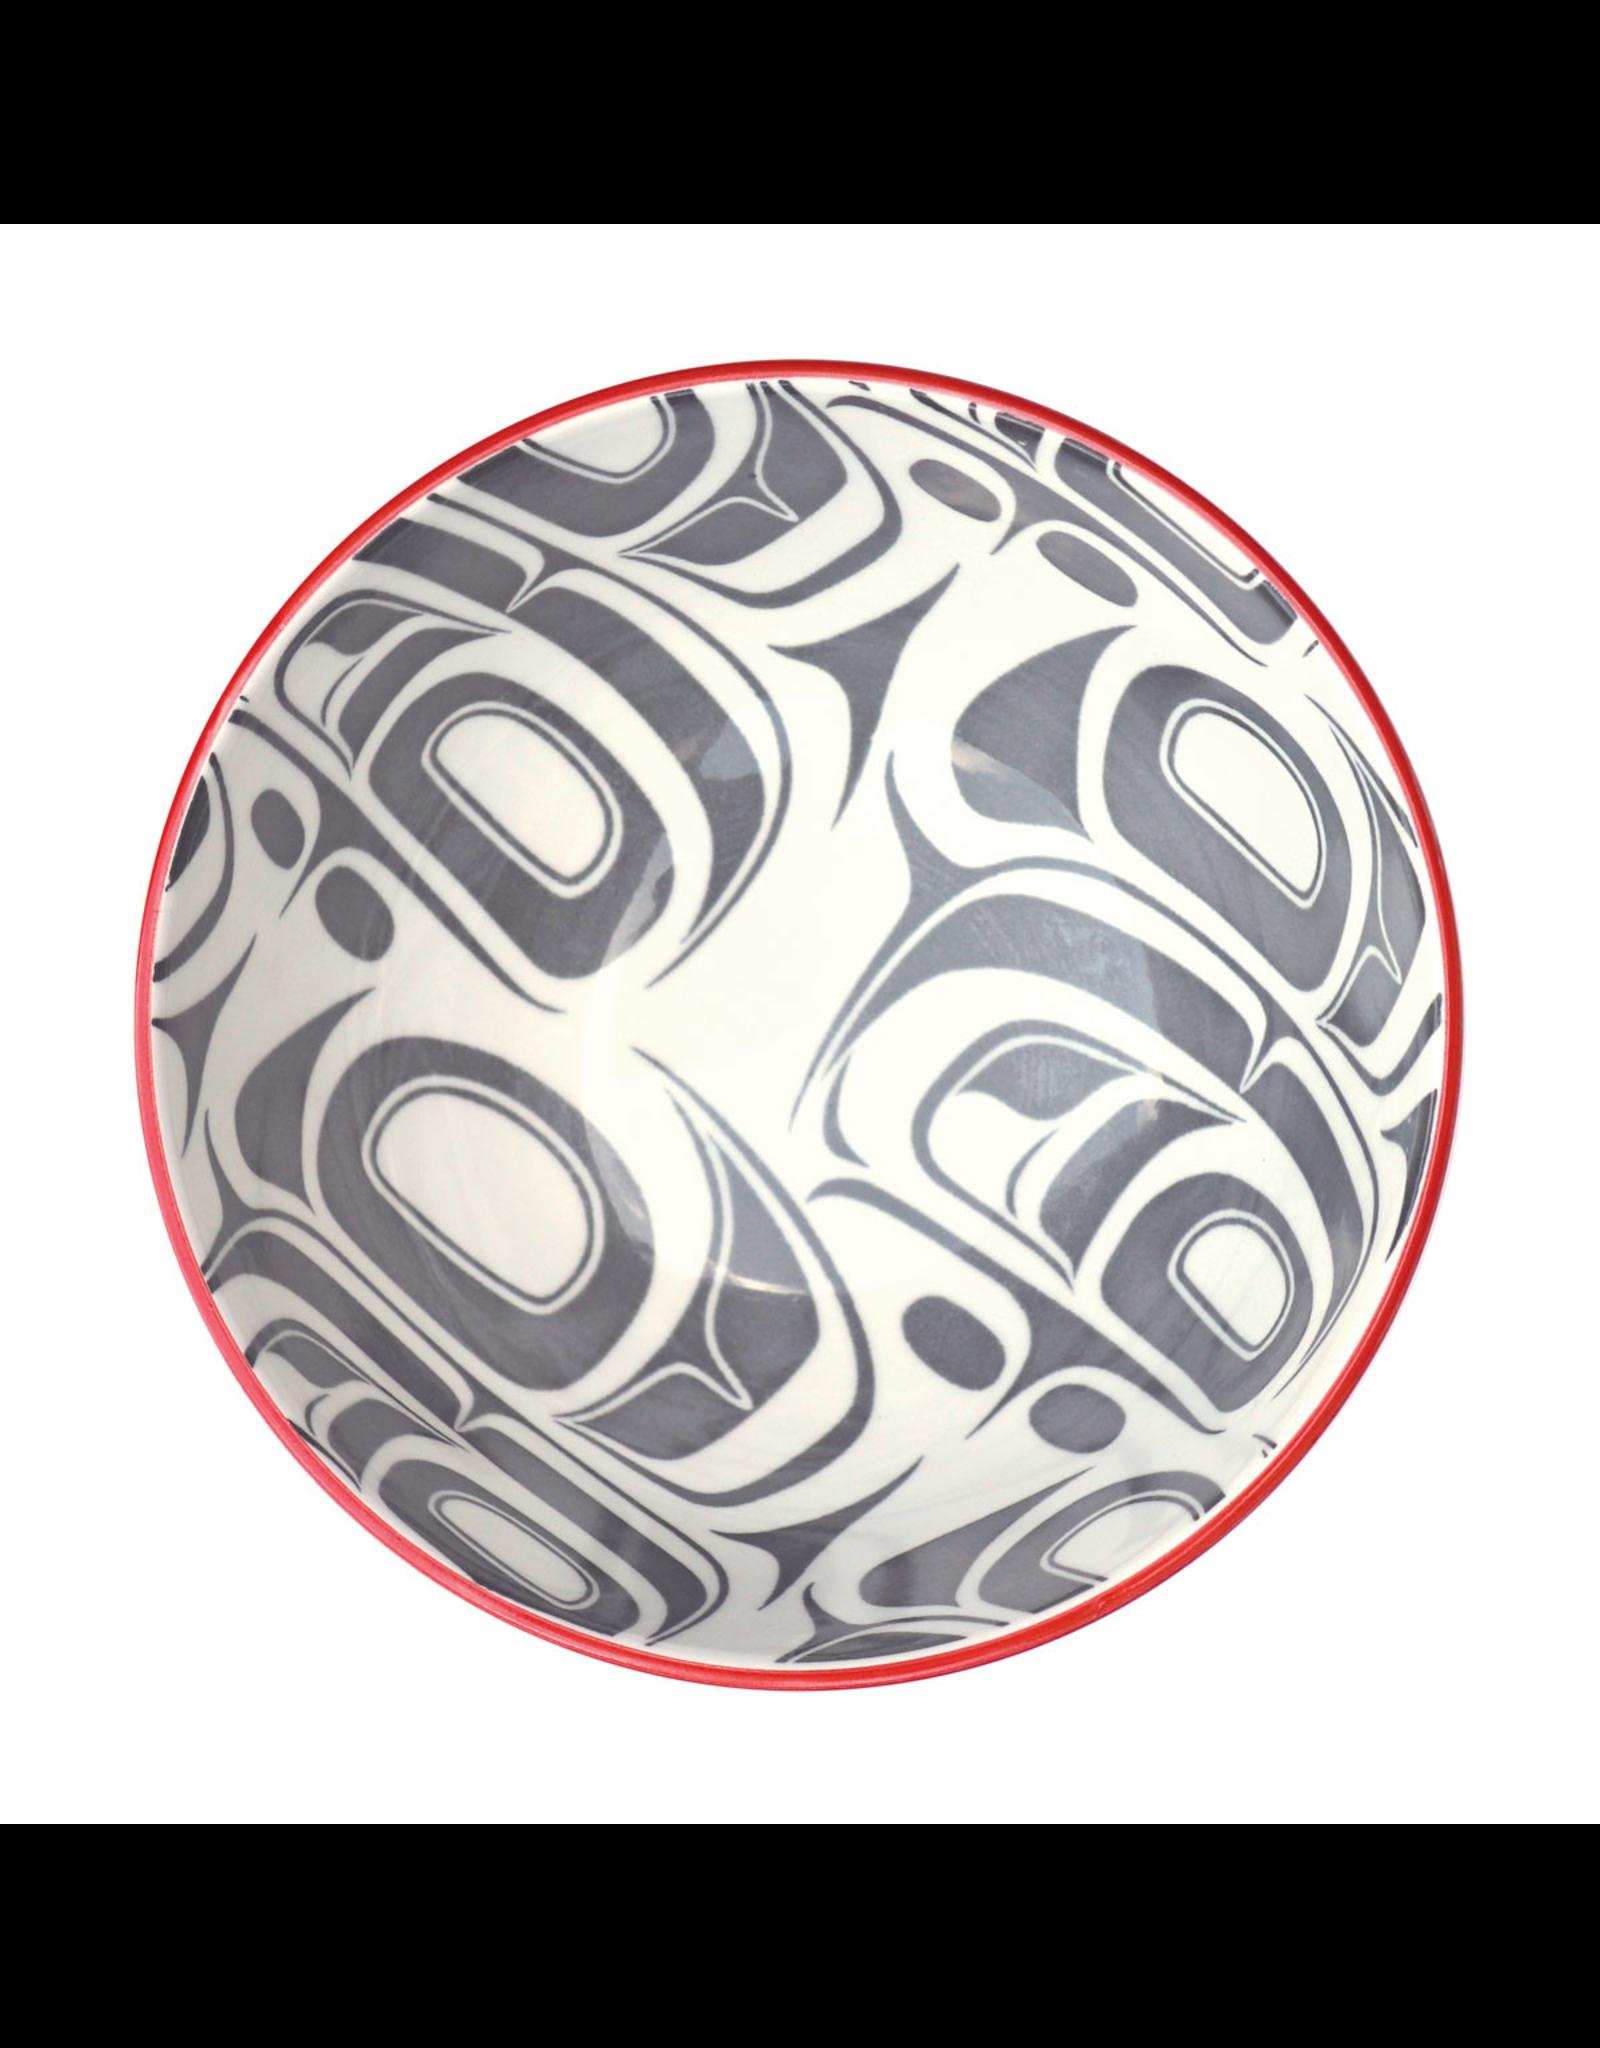 Medium Art Bowl - Transforming Eagle by Ryan Cranmer (BOWLM12)